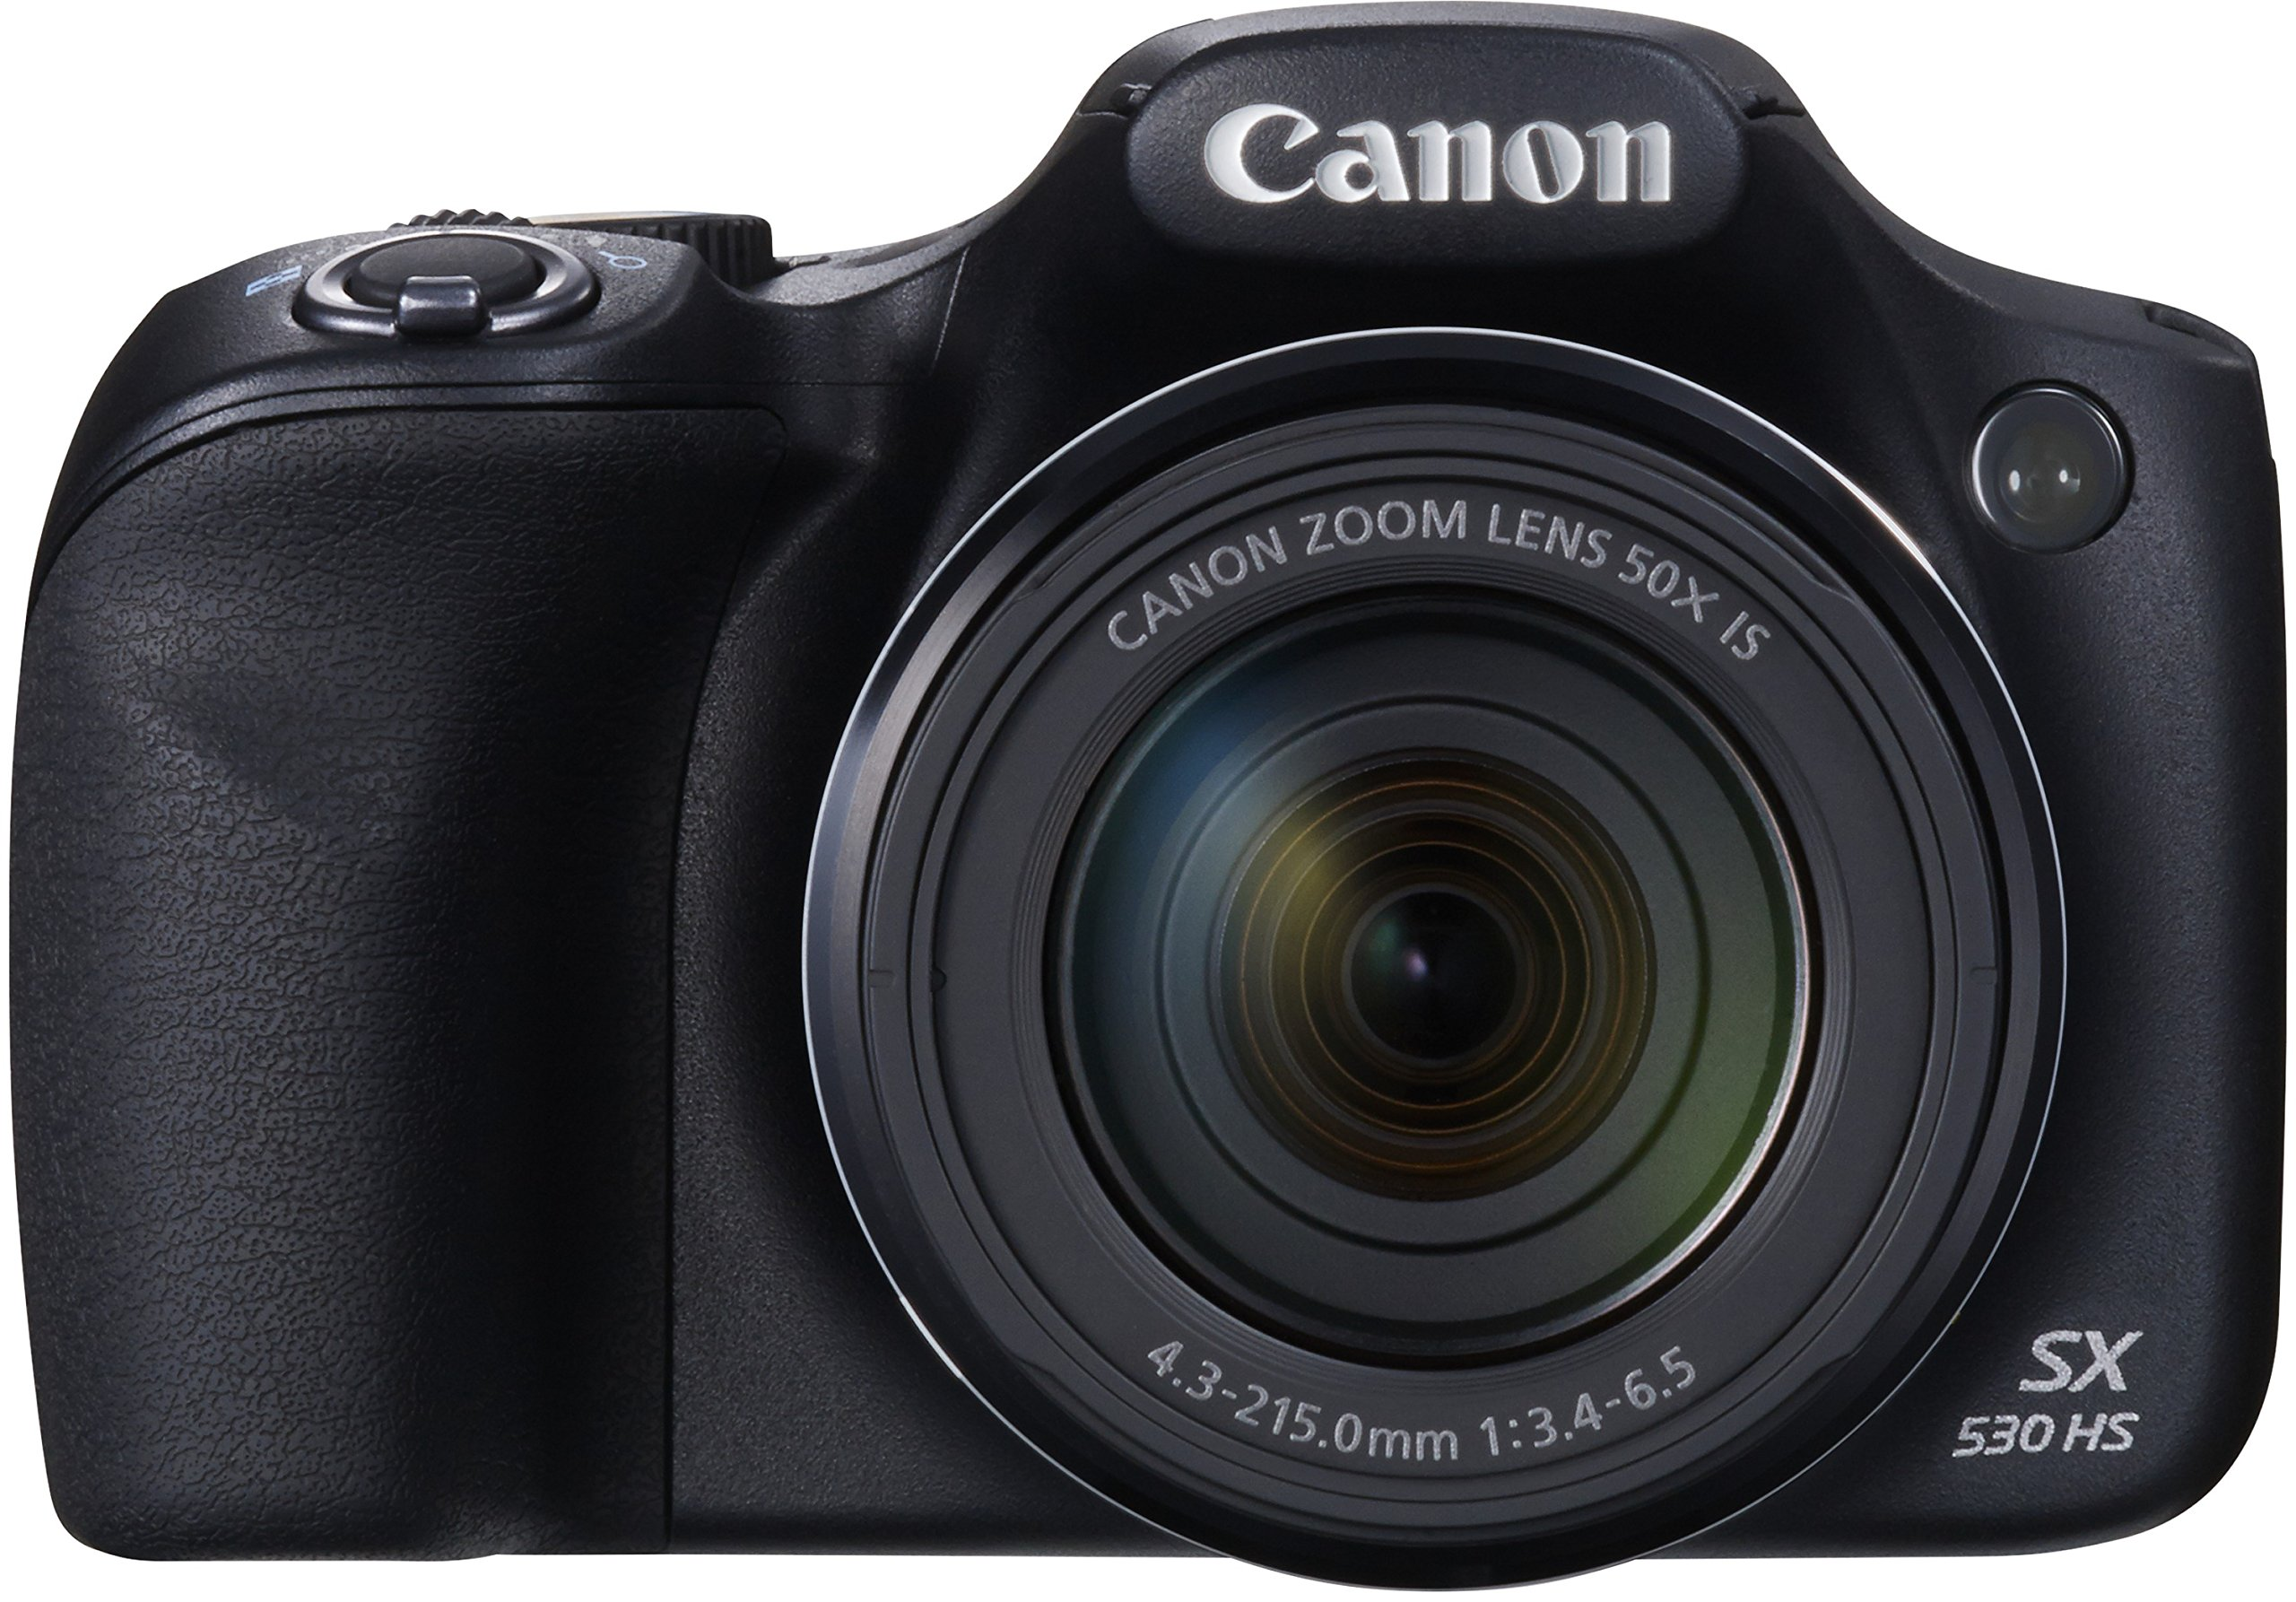 Canon PowerShot SX530 HS Fotocamera Compatta Digitale, 16 Megapixel, Nero/Antracite product image